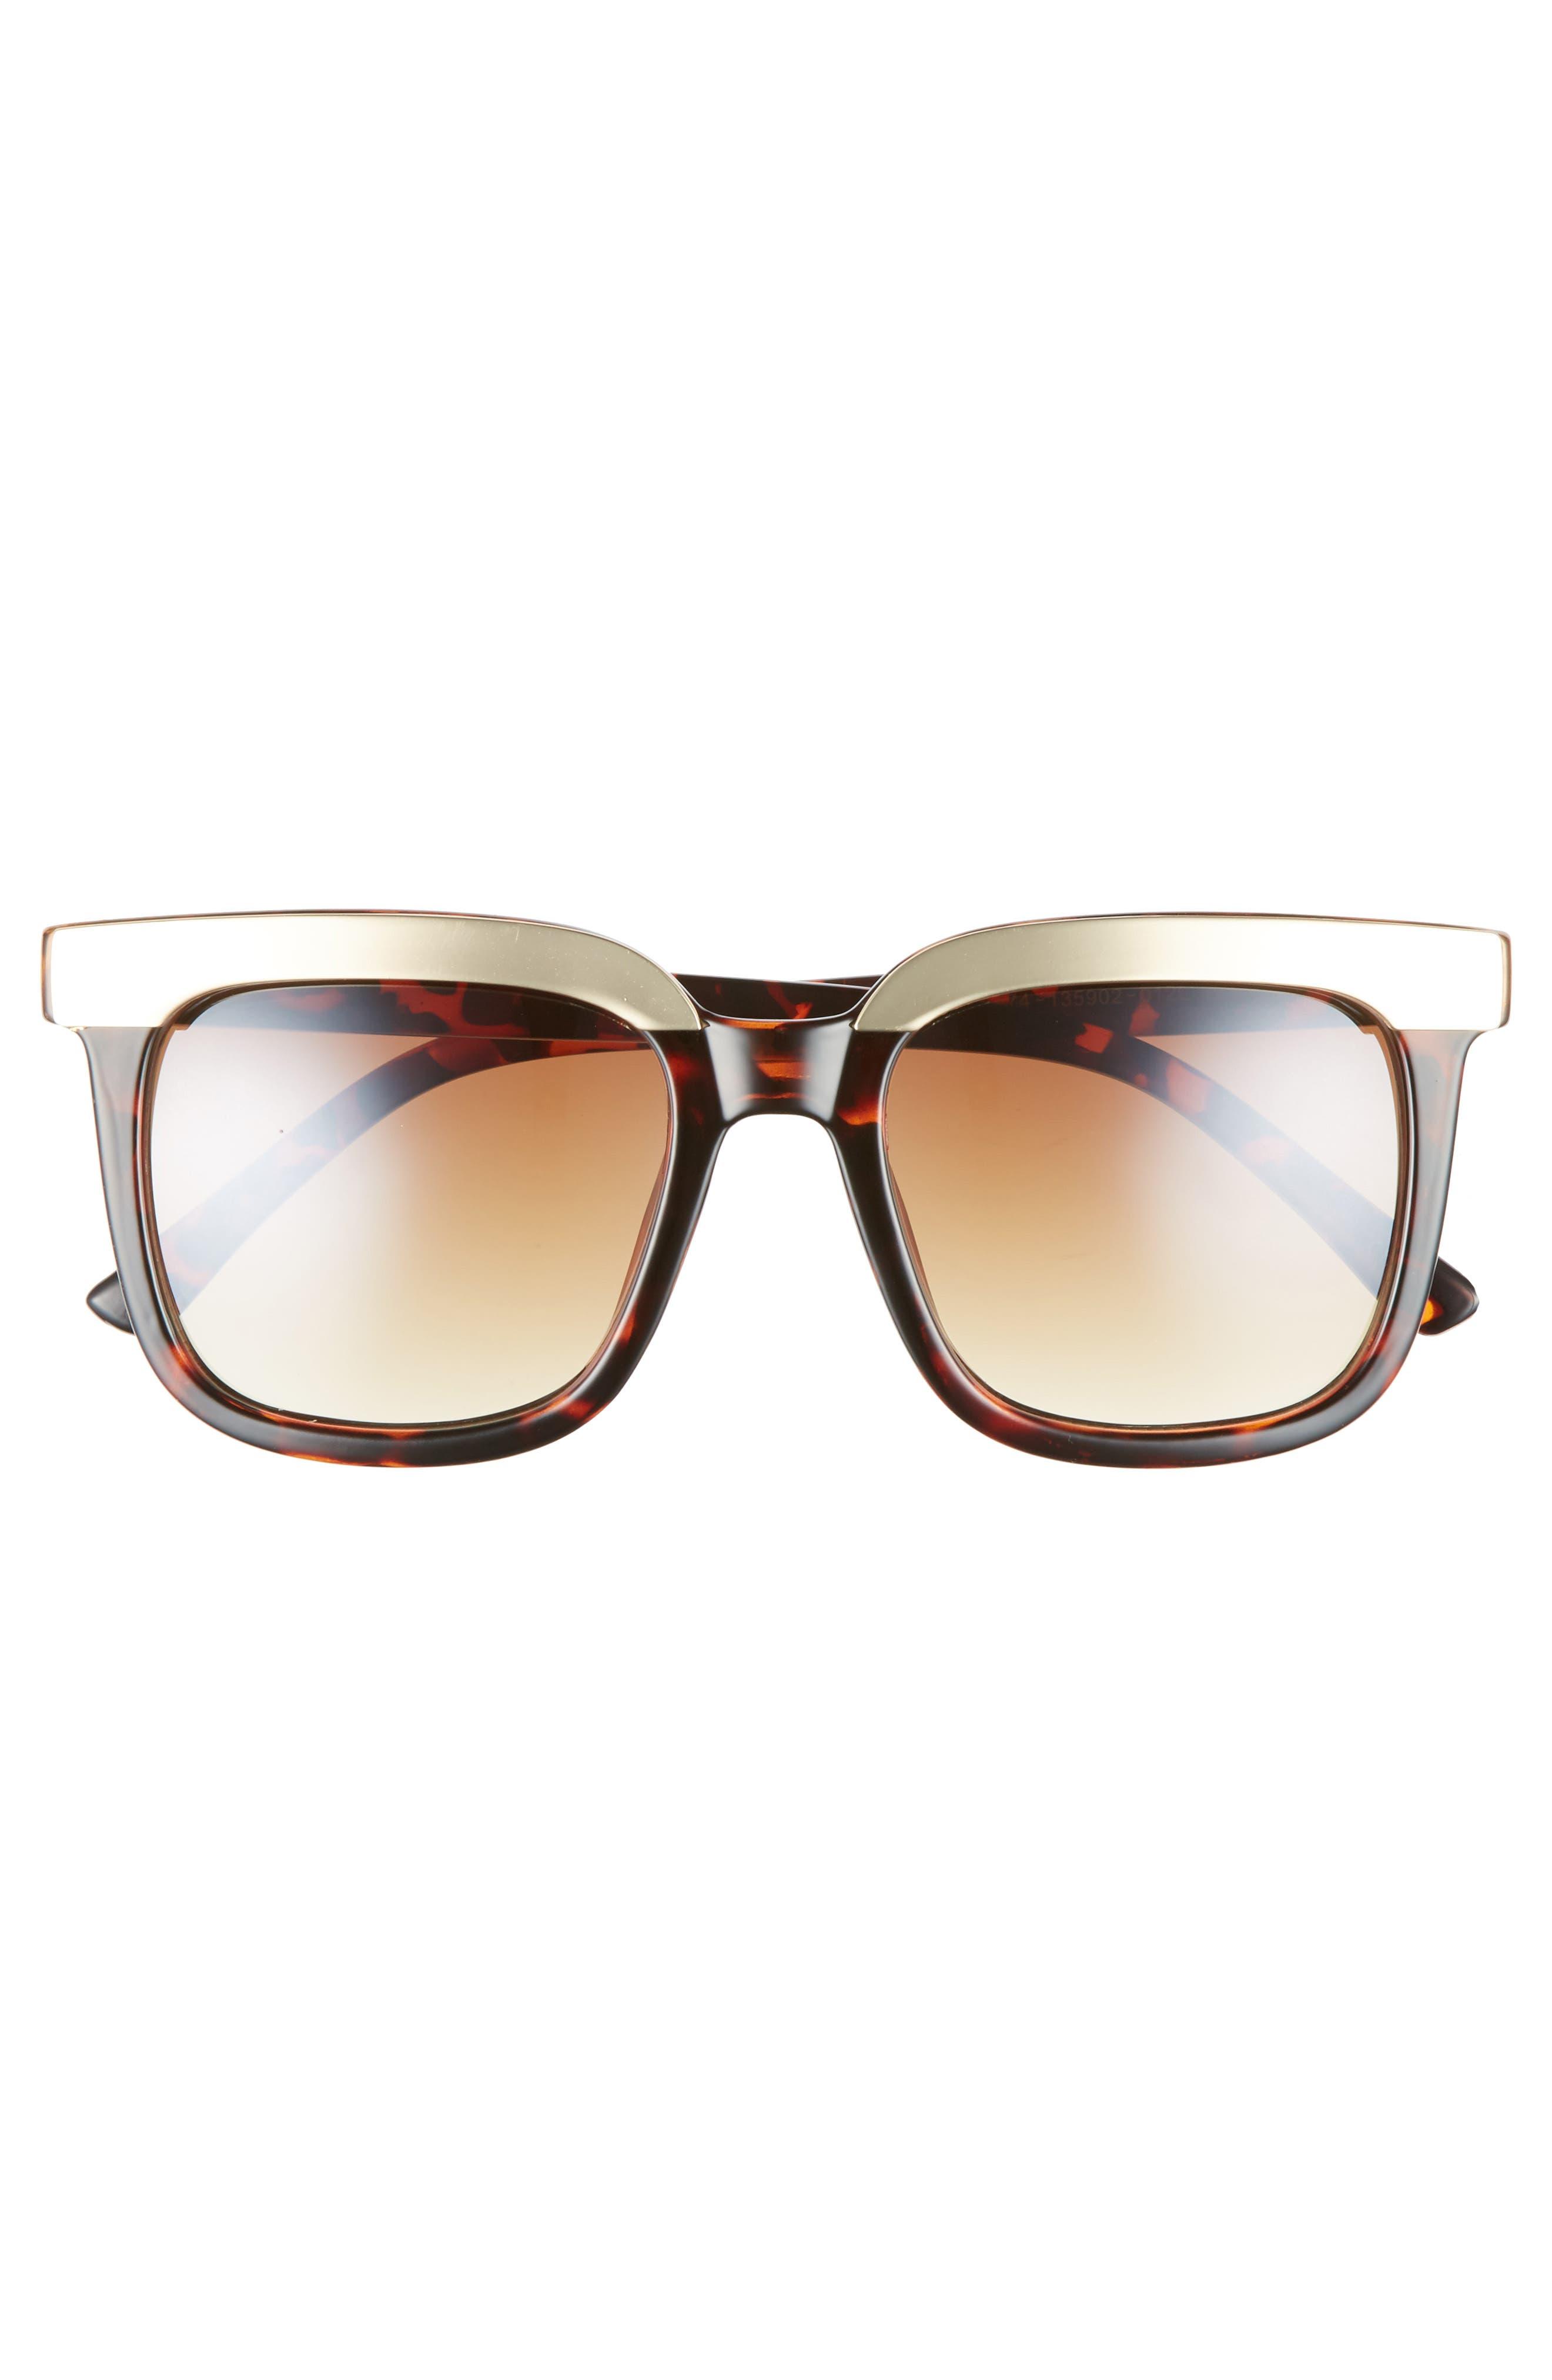 52mm Metal Dipped Square Sunglasses,                             Alternate thumbnail 3, color,                             200